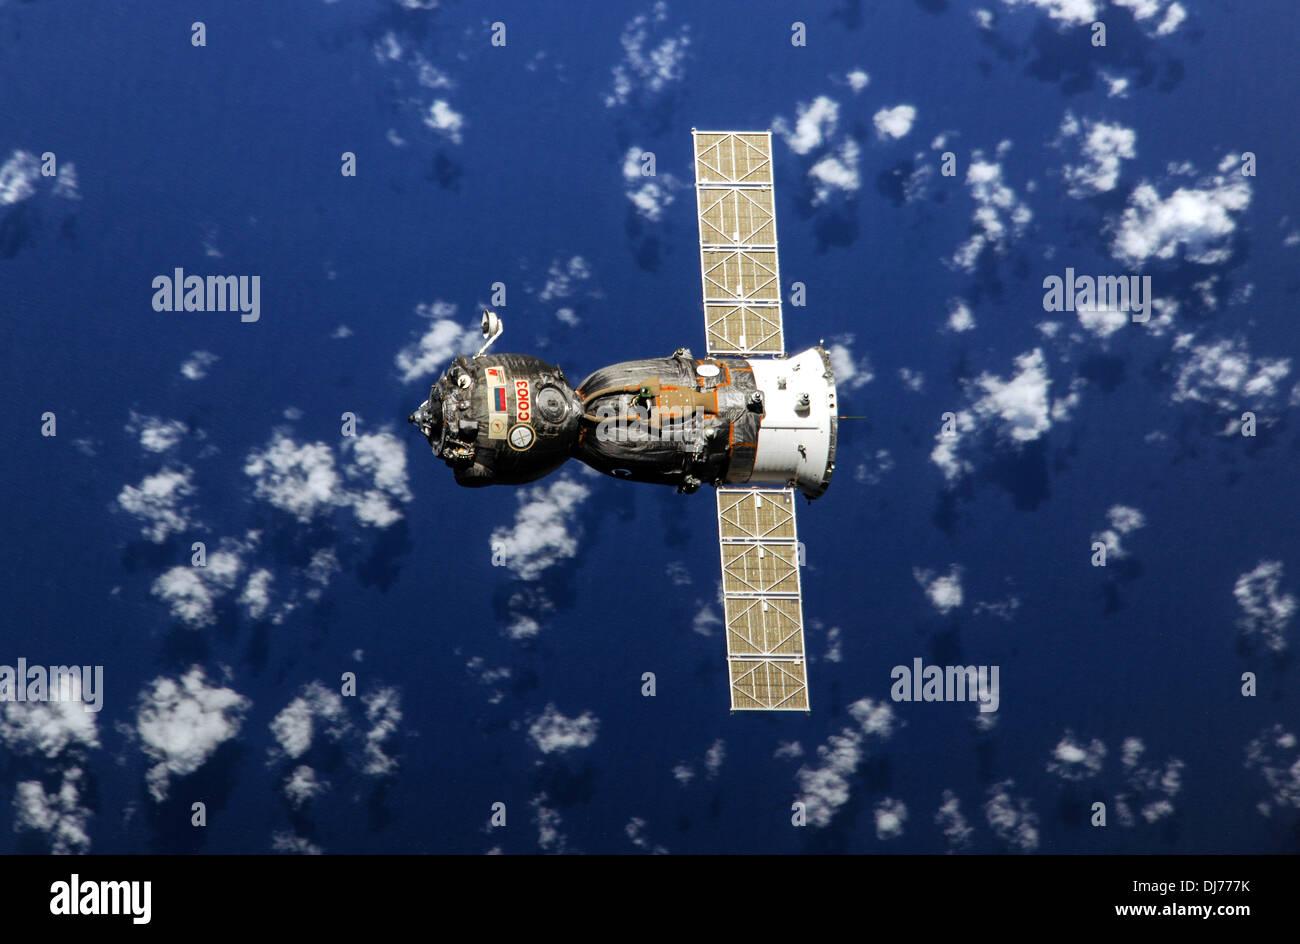 Soyuz TMA-08M spacecraft returns to Earth - Stock Image